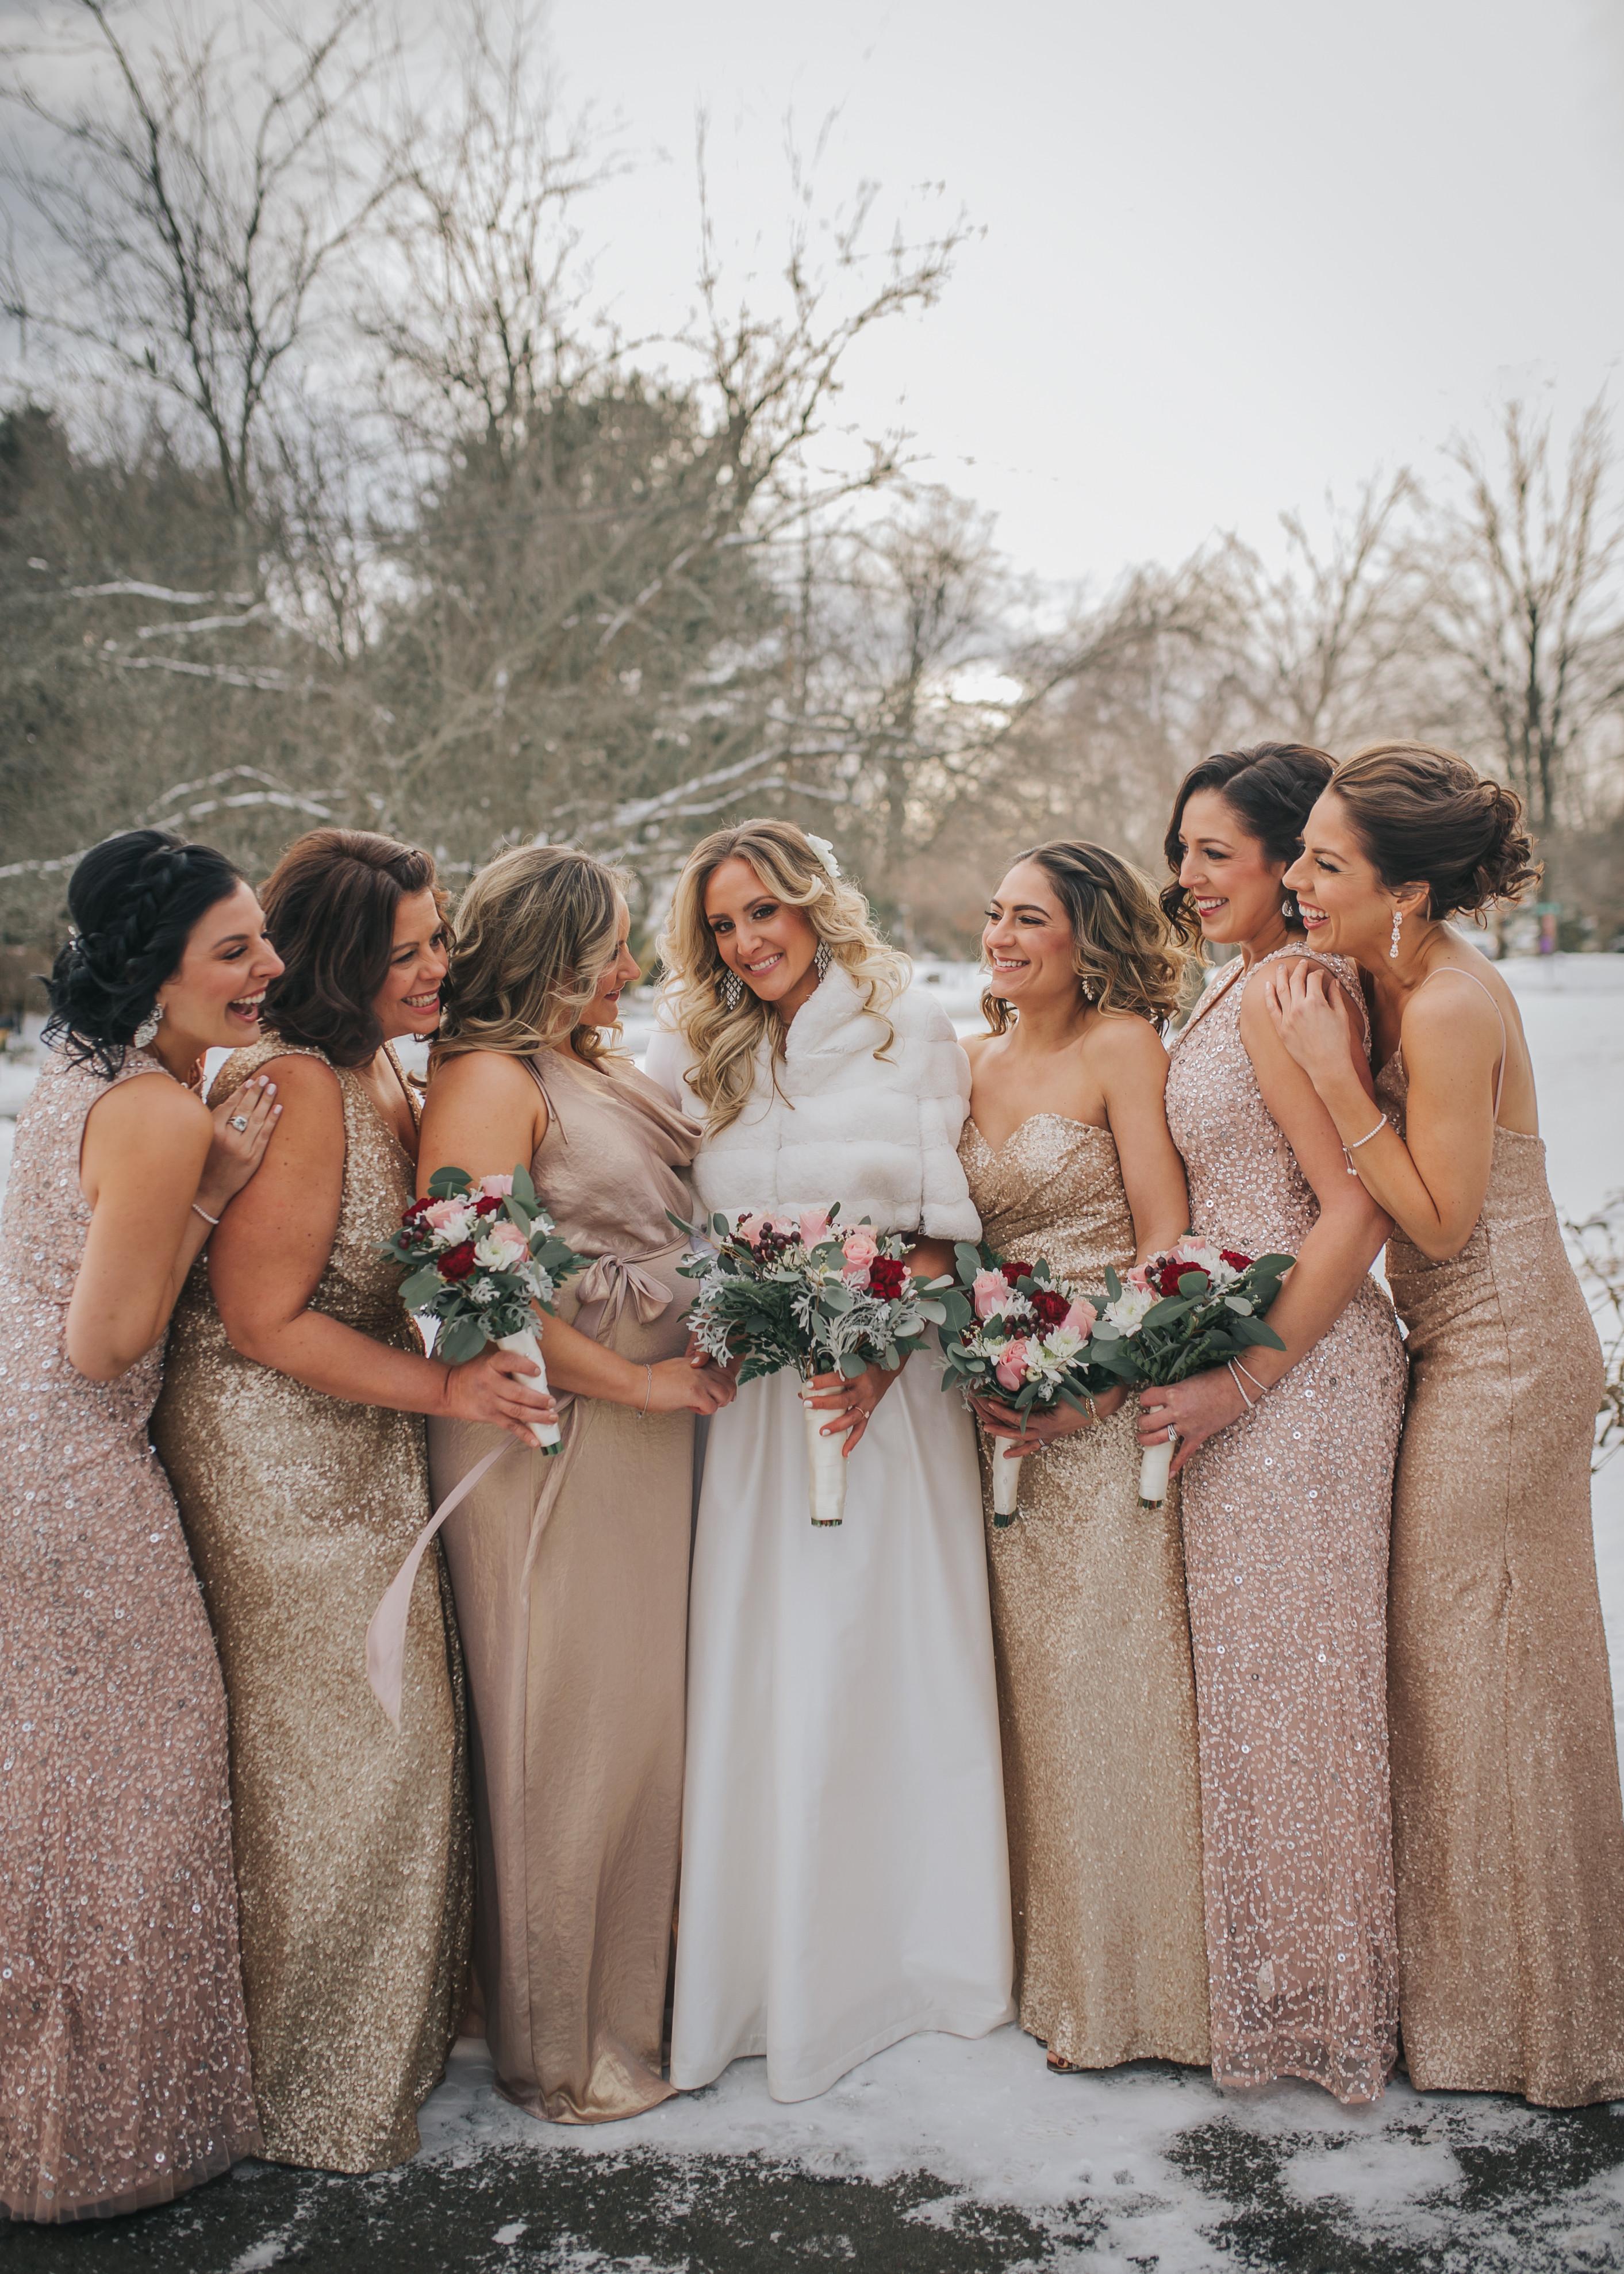 Bridesmaid Appt. with 1-3 bridesmaid